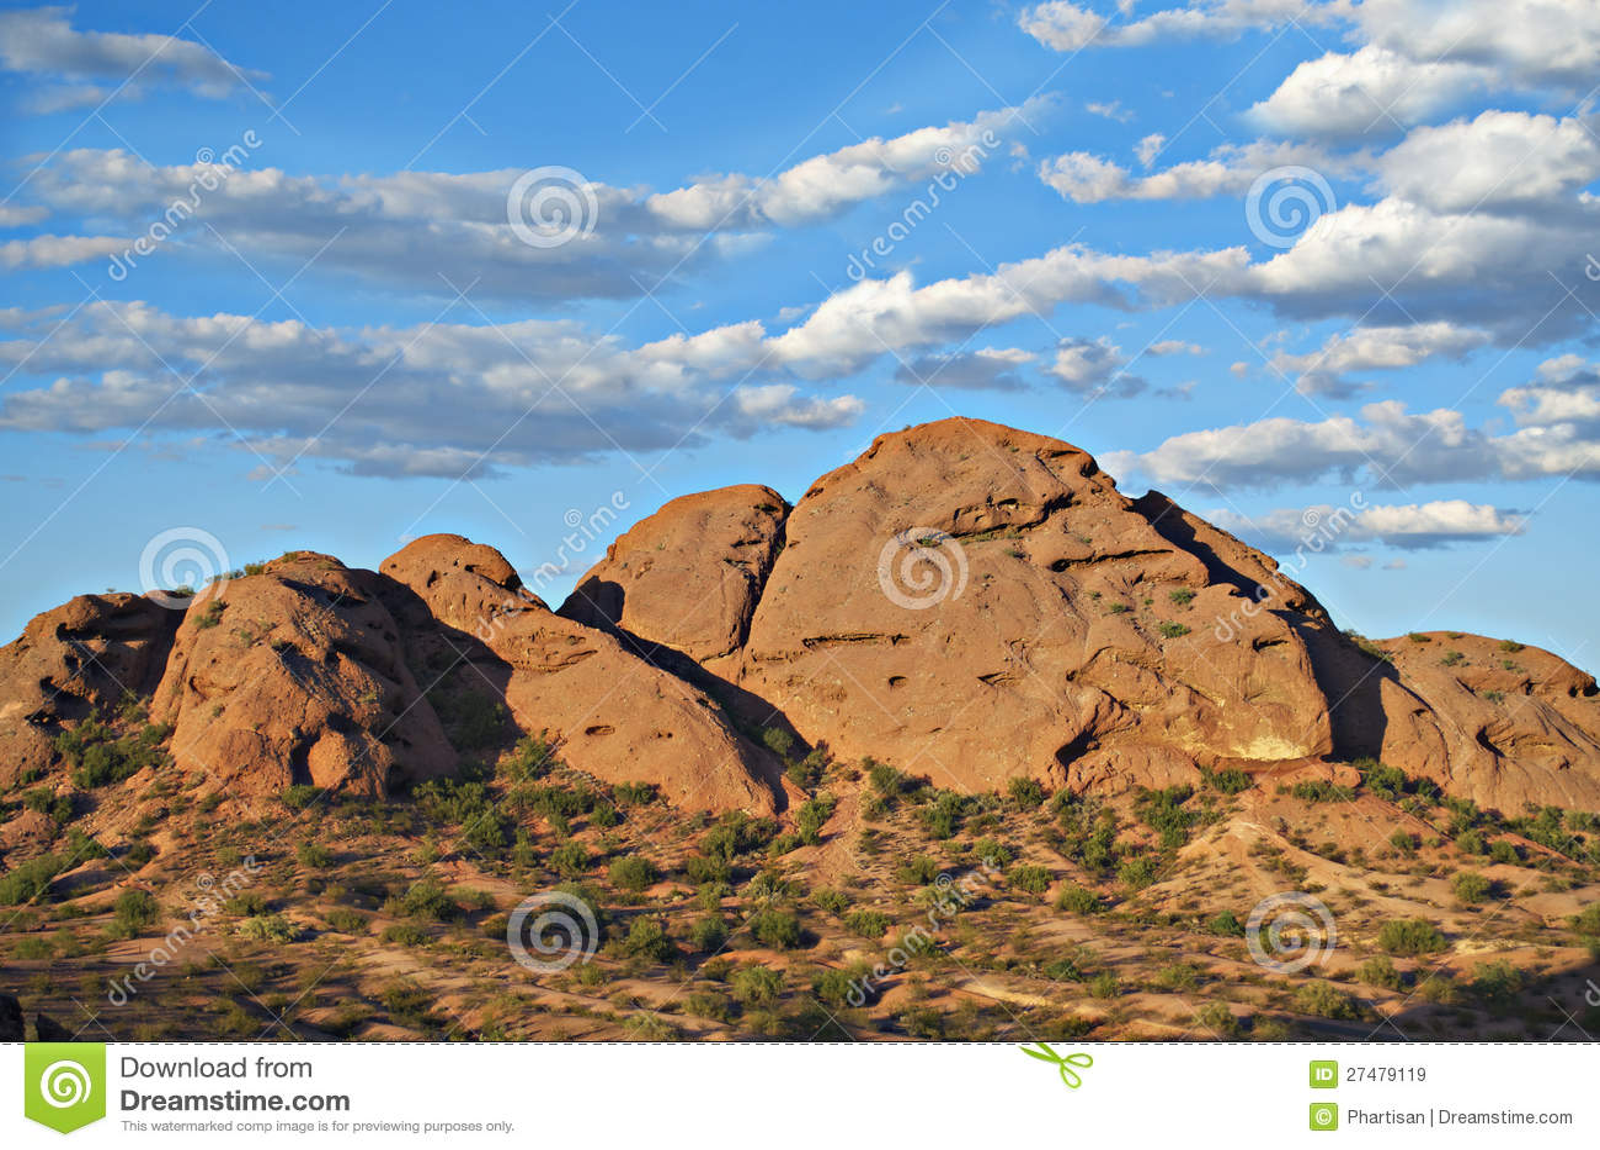 Papago Park Recreation Park In Phoenix Az Stock Image - Image of ...